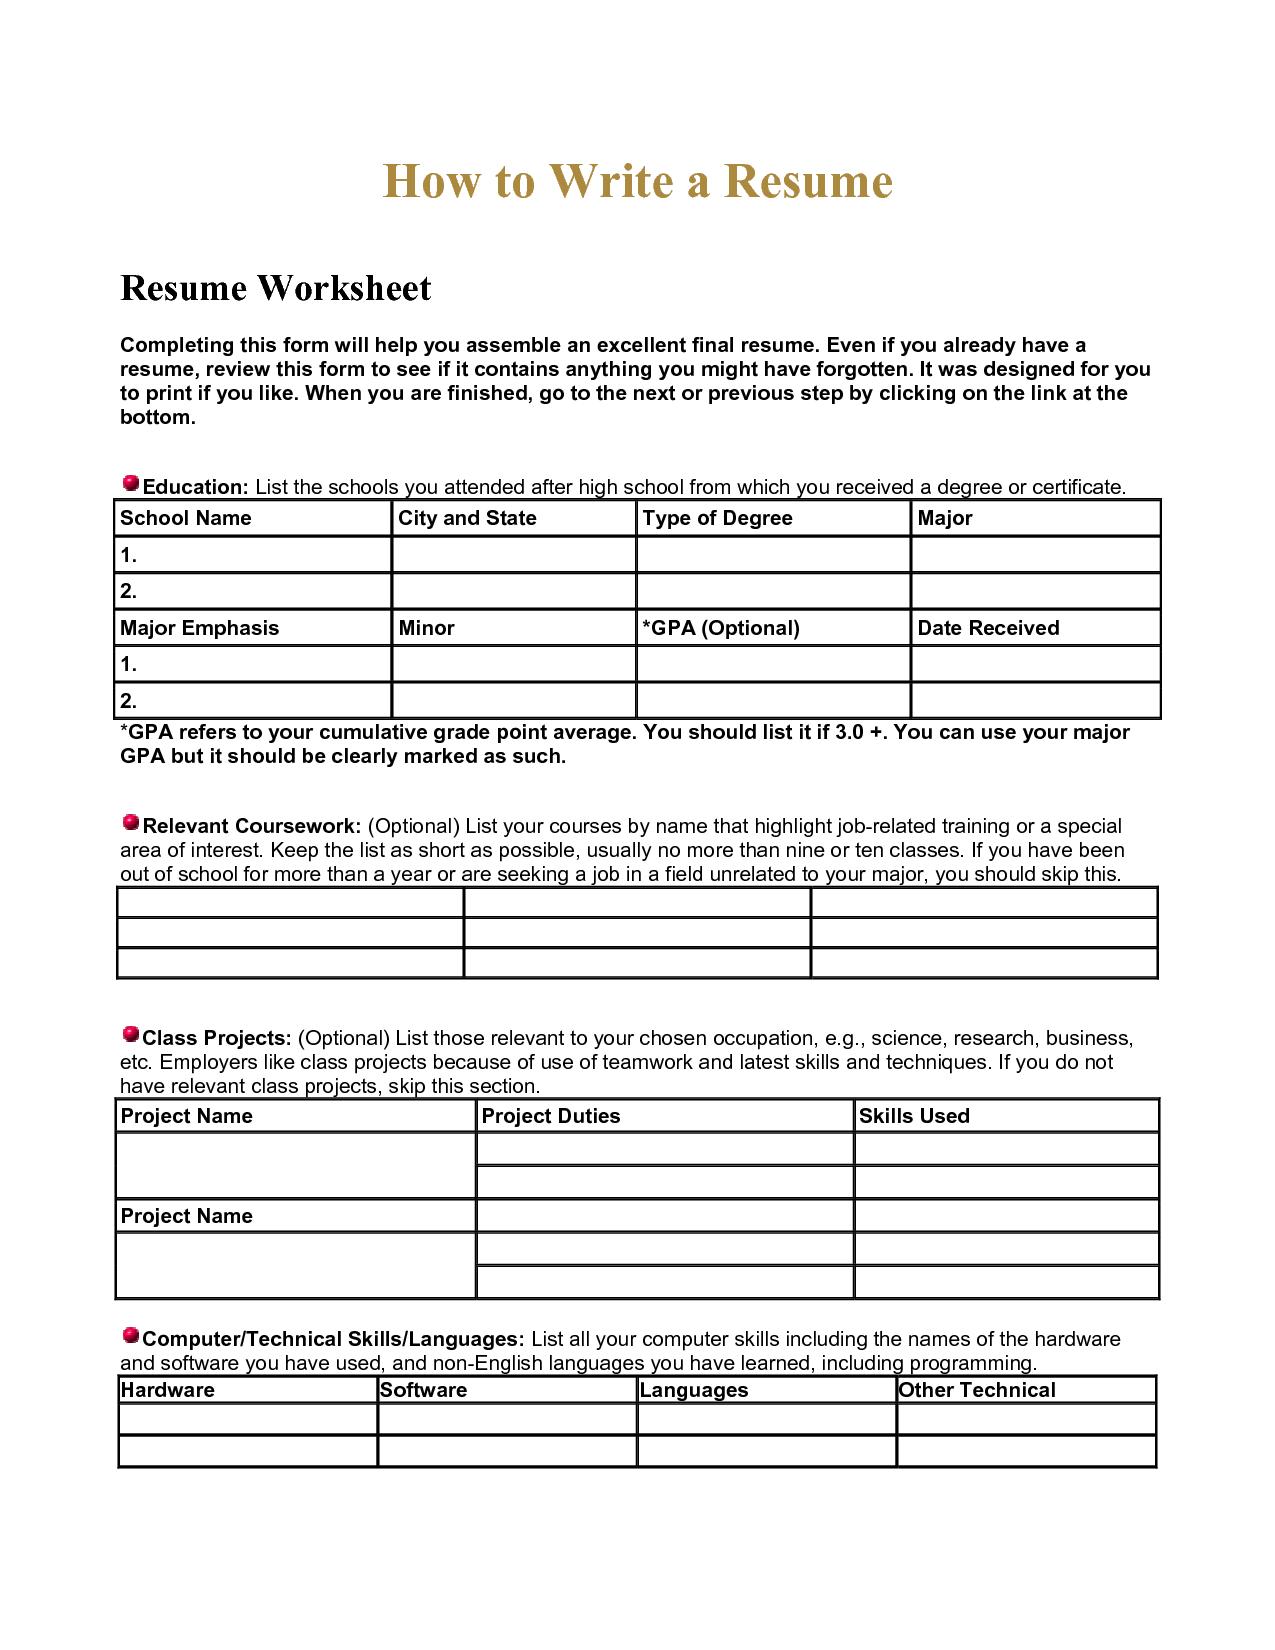 online resume maker for highschool students what your resume online resume maker for highschool students rsum builder myfuture resume builder resume template acting resume maker